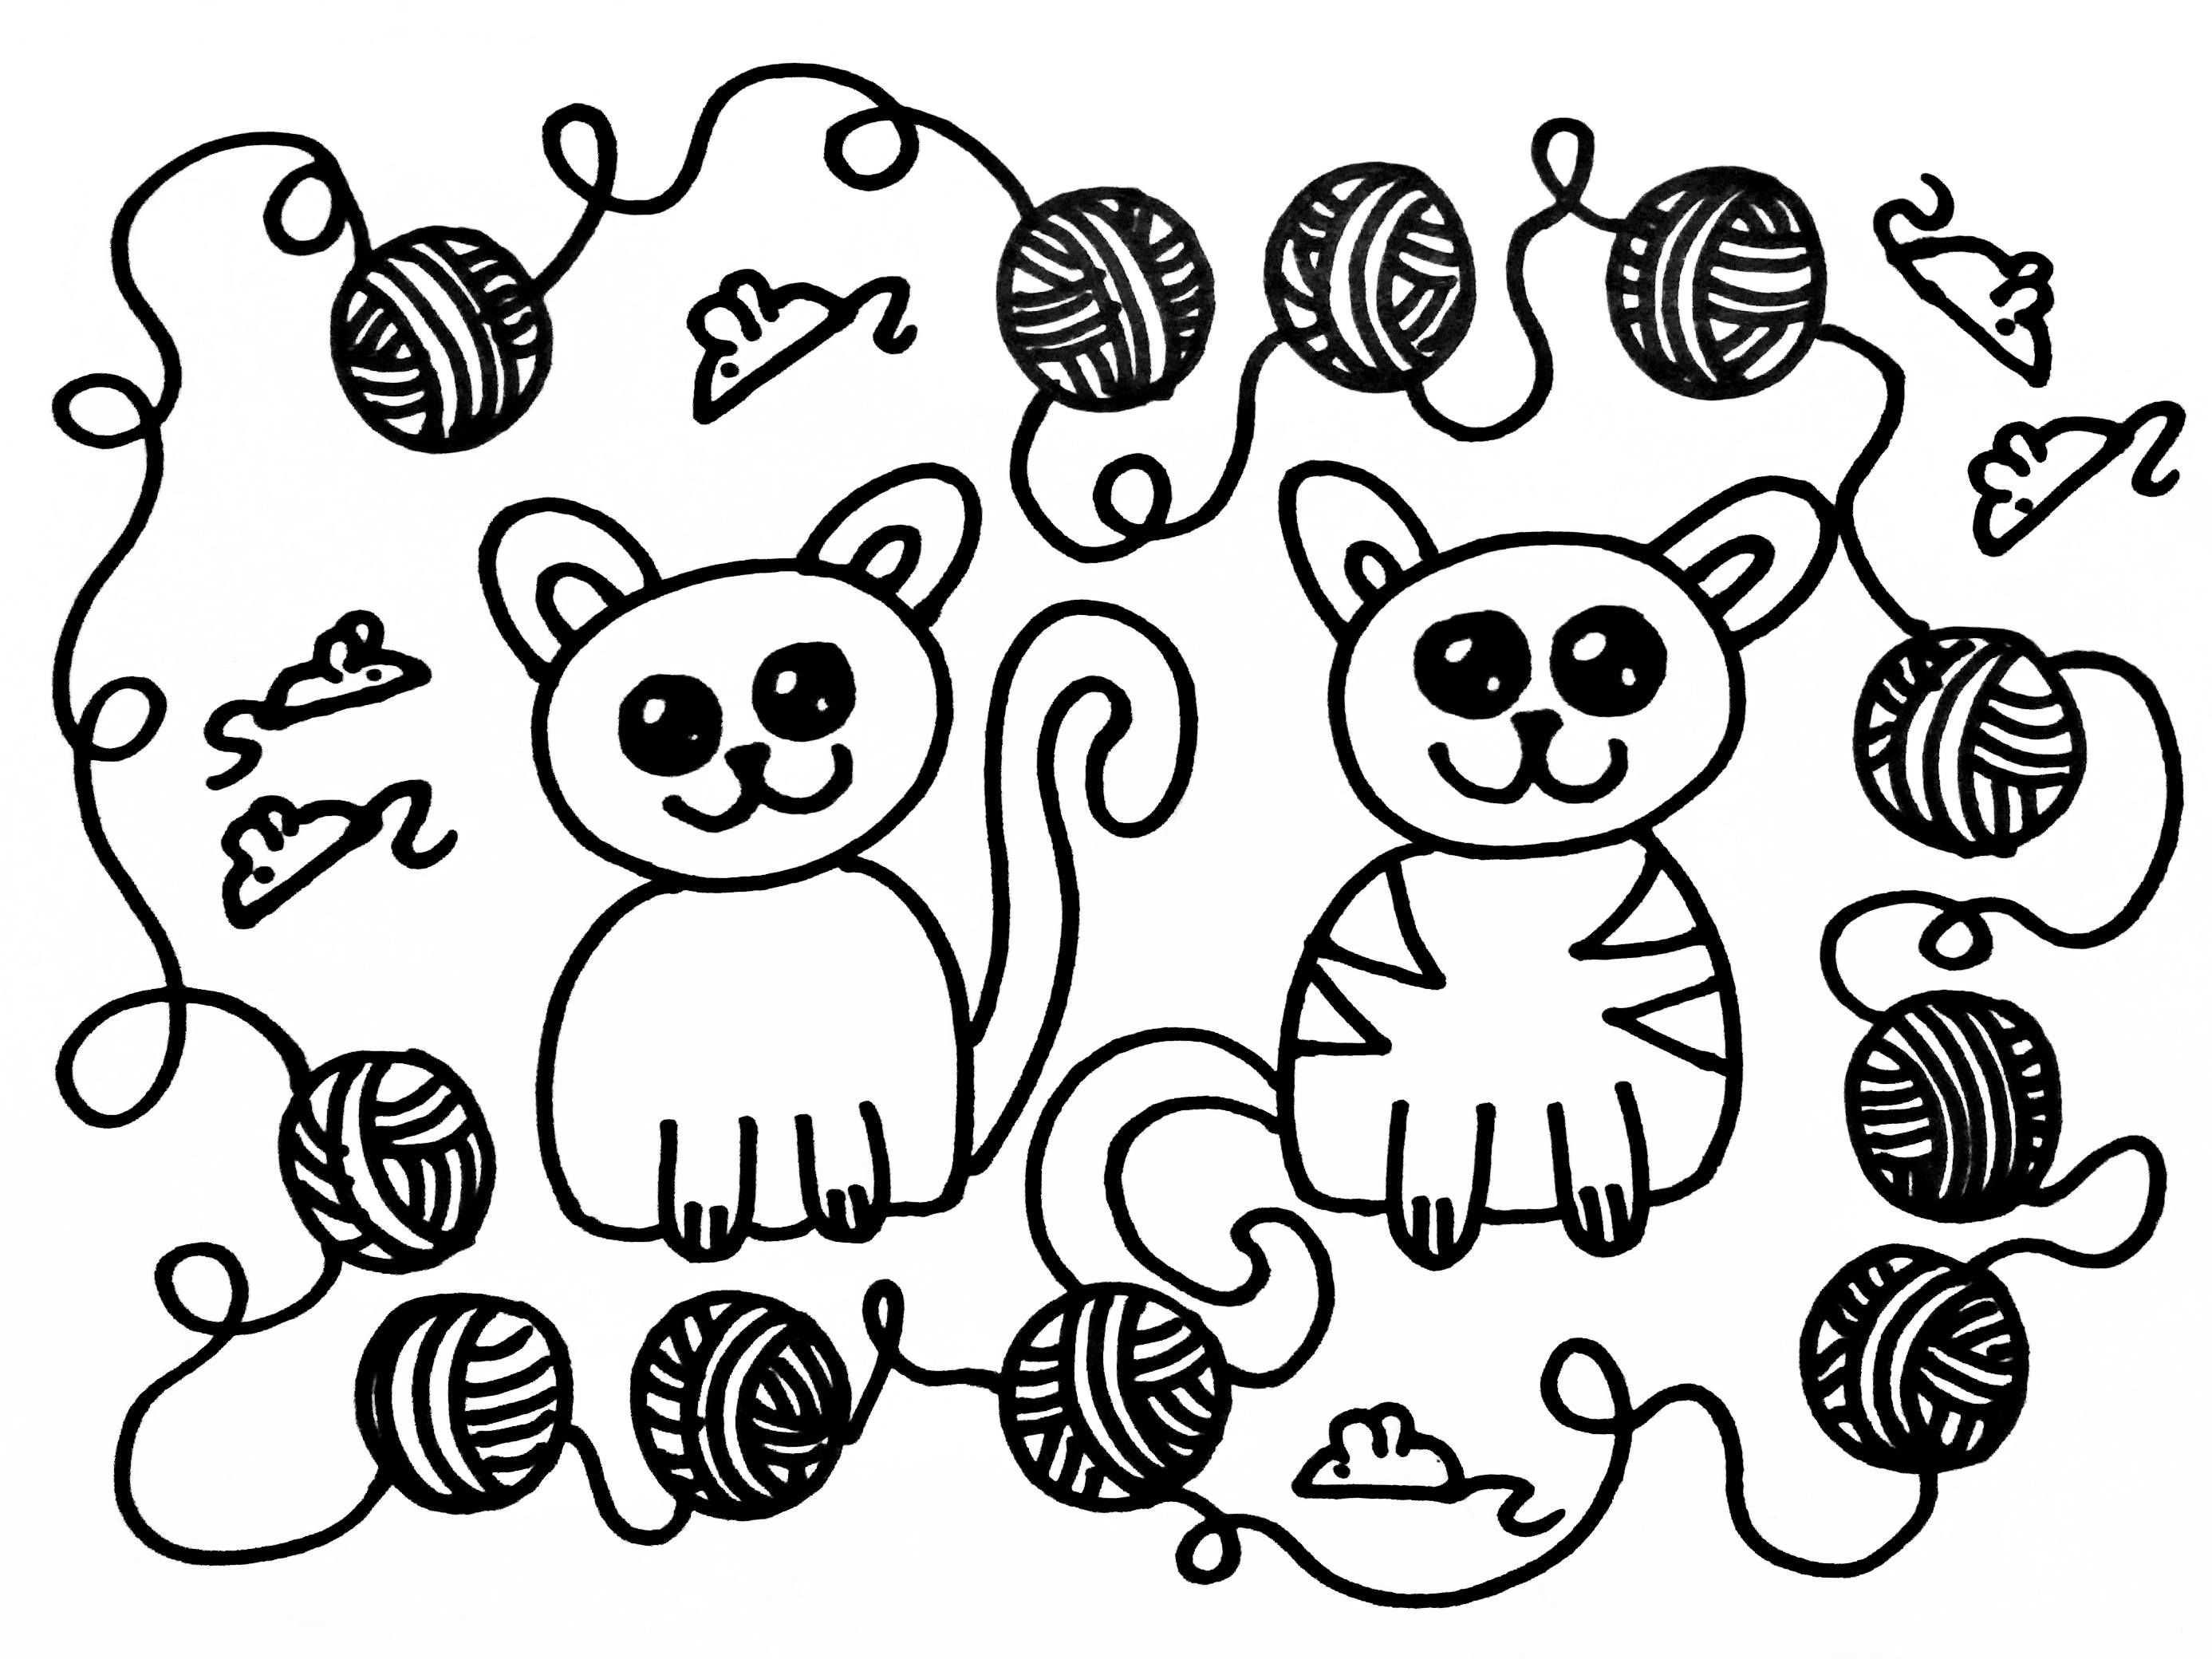 Kleurplaten Katten Katten Kleurplaten